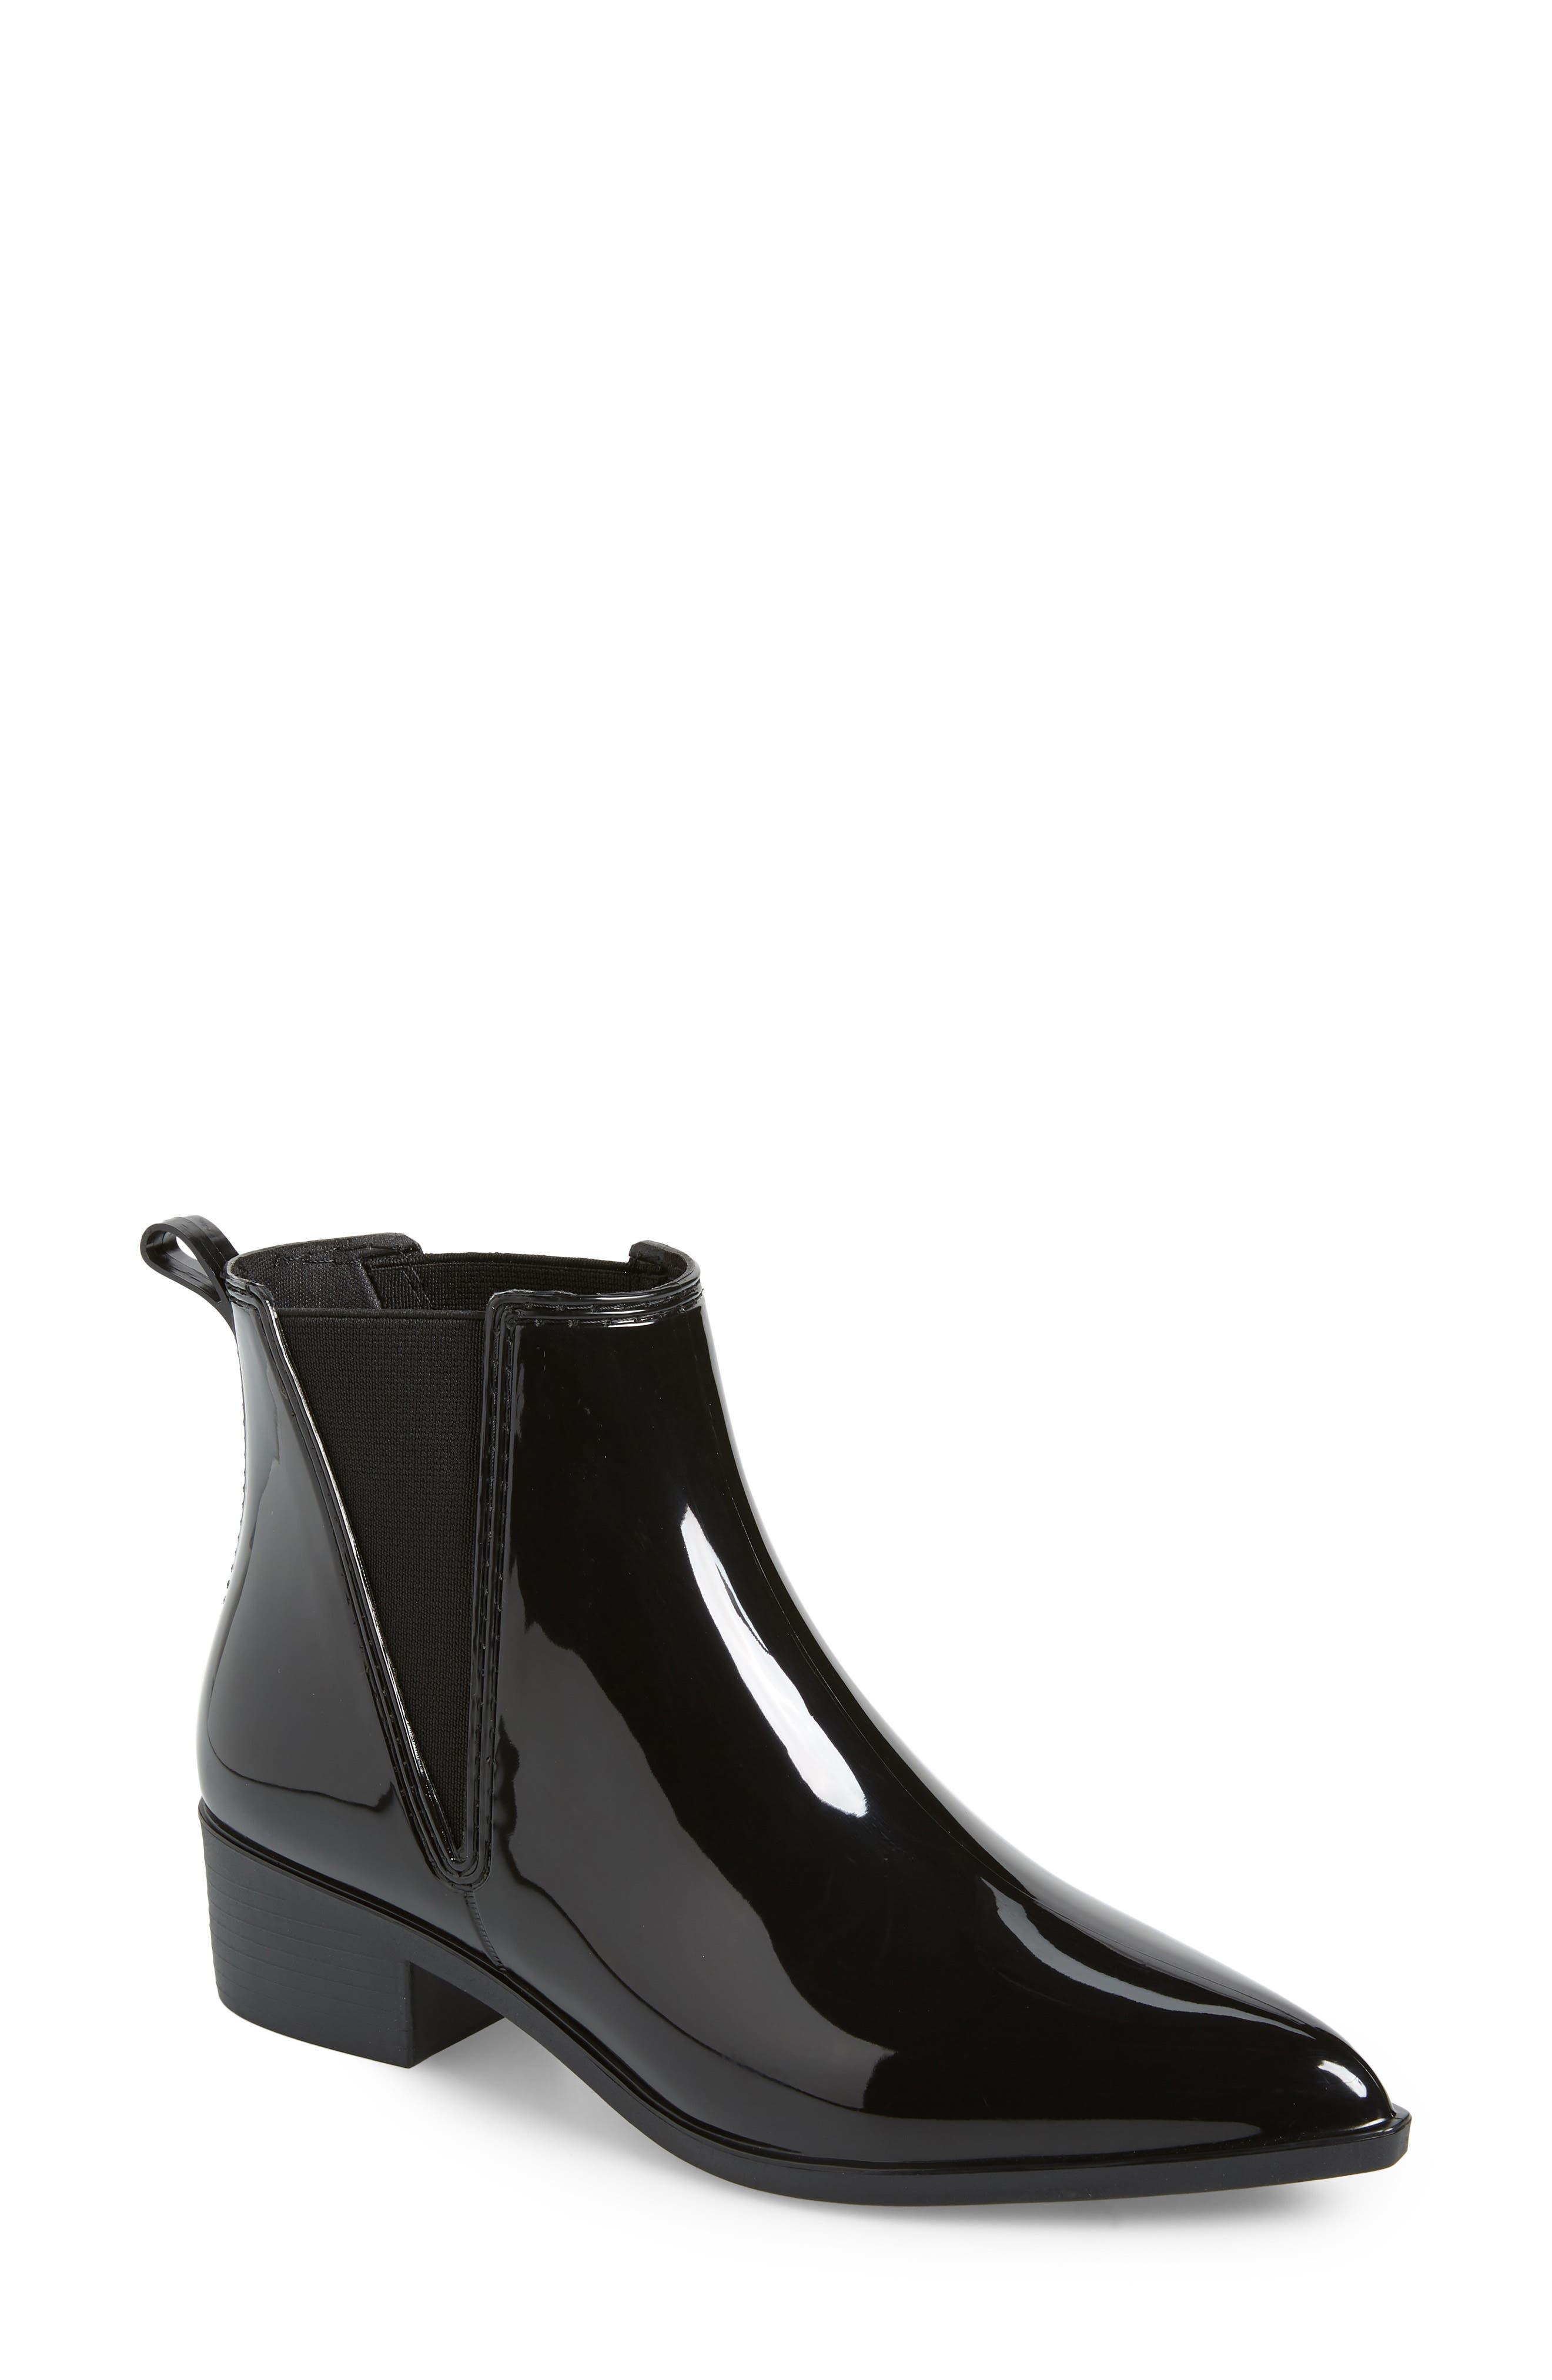 Mist Chelsea Waterproof Rain Boot,                             Main thumbnail 1, color,                             BLACK SHINY